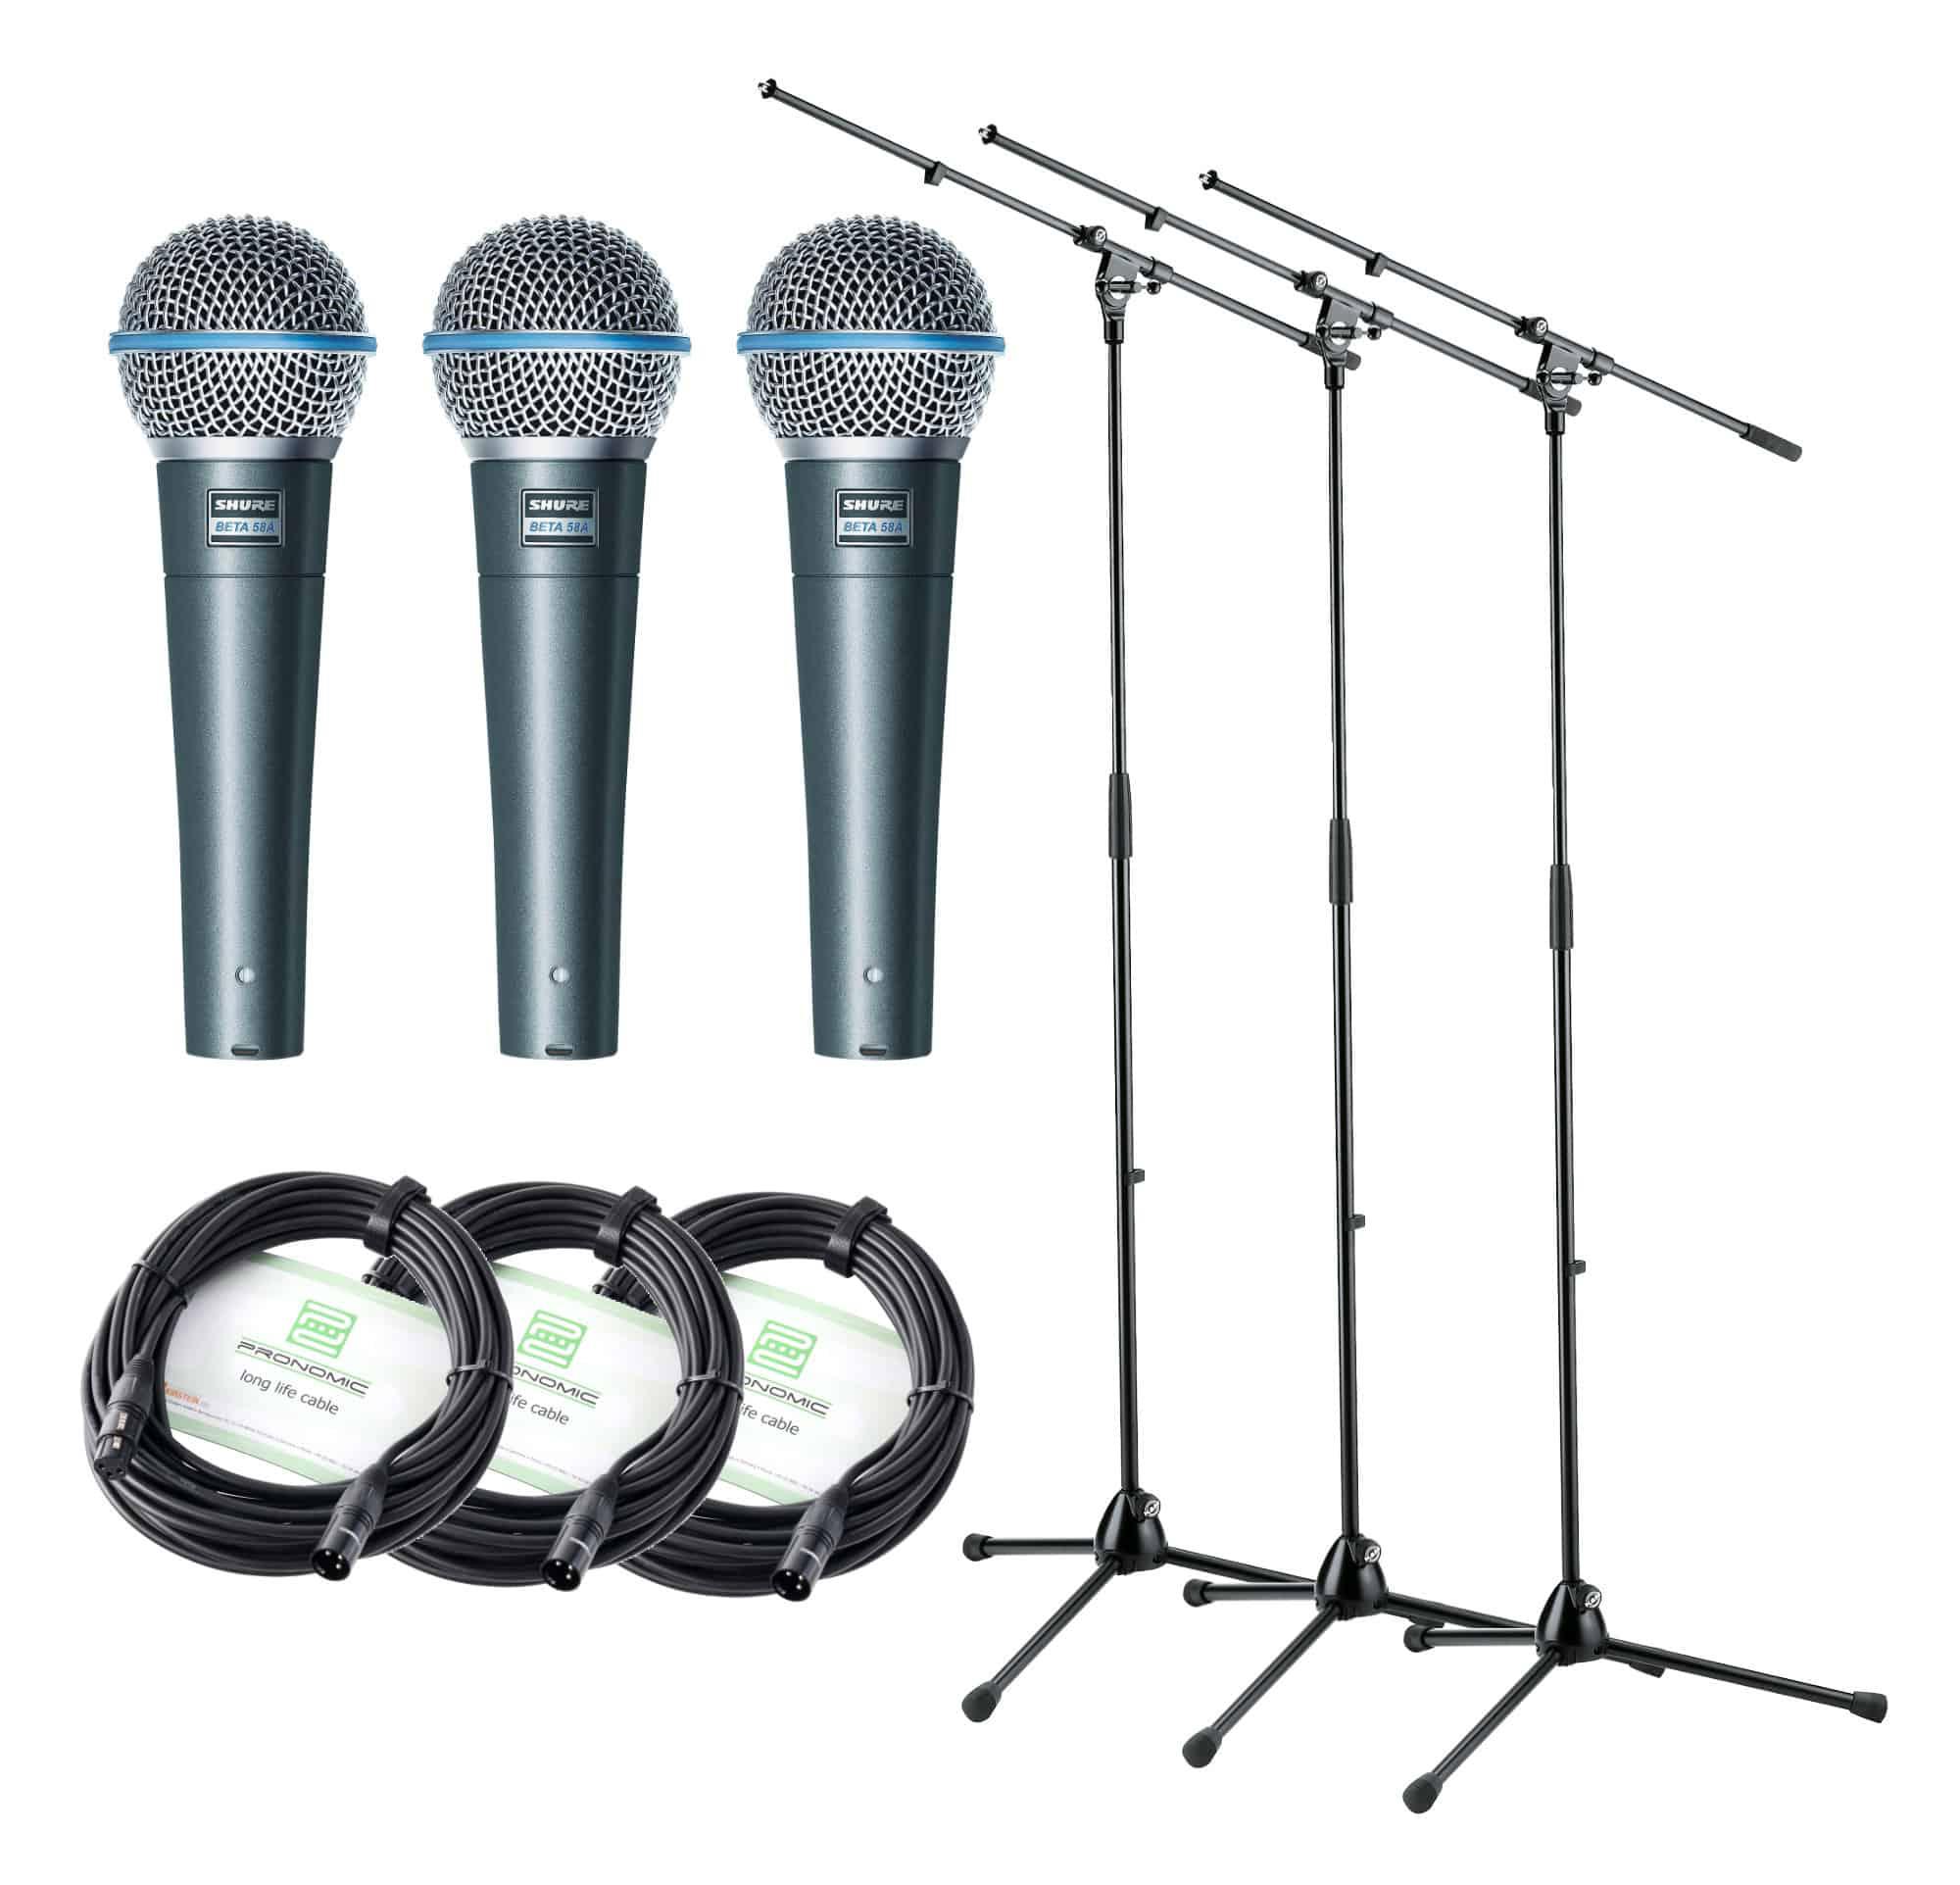 Mikrofone - Shure Beta 58A Mikrofon 3x3 Set Ständer Kabel 3 Mikrofone - Onlineshop Musikhaus Kirstein